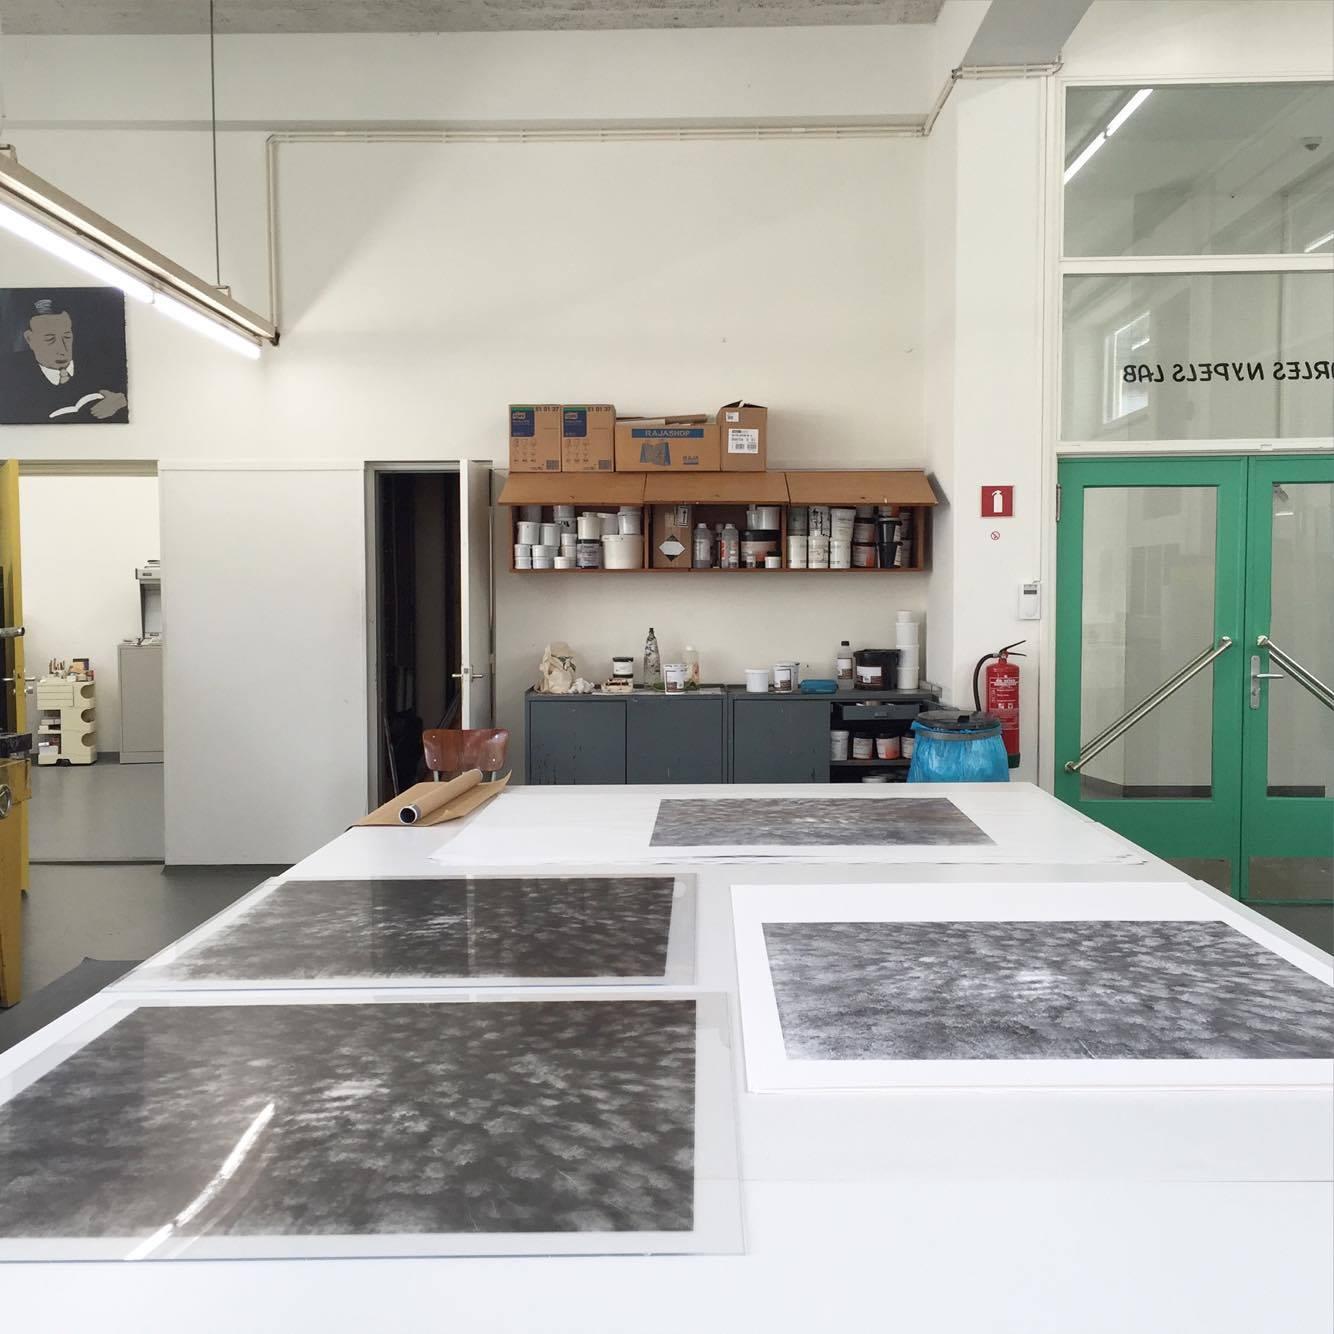 Black Mountain, Jan van Eyck Academie, 2016